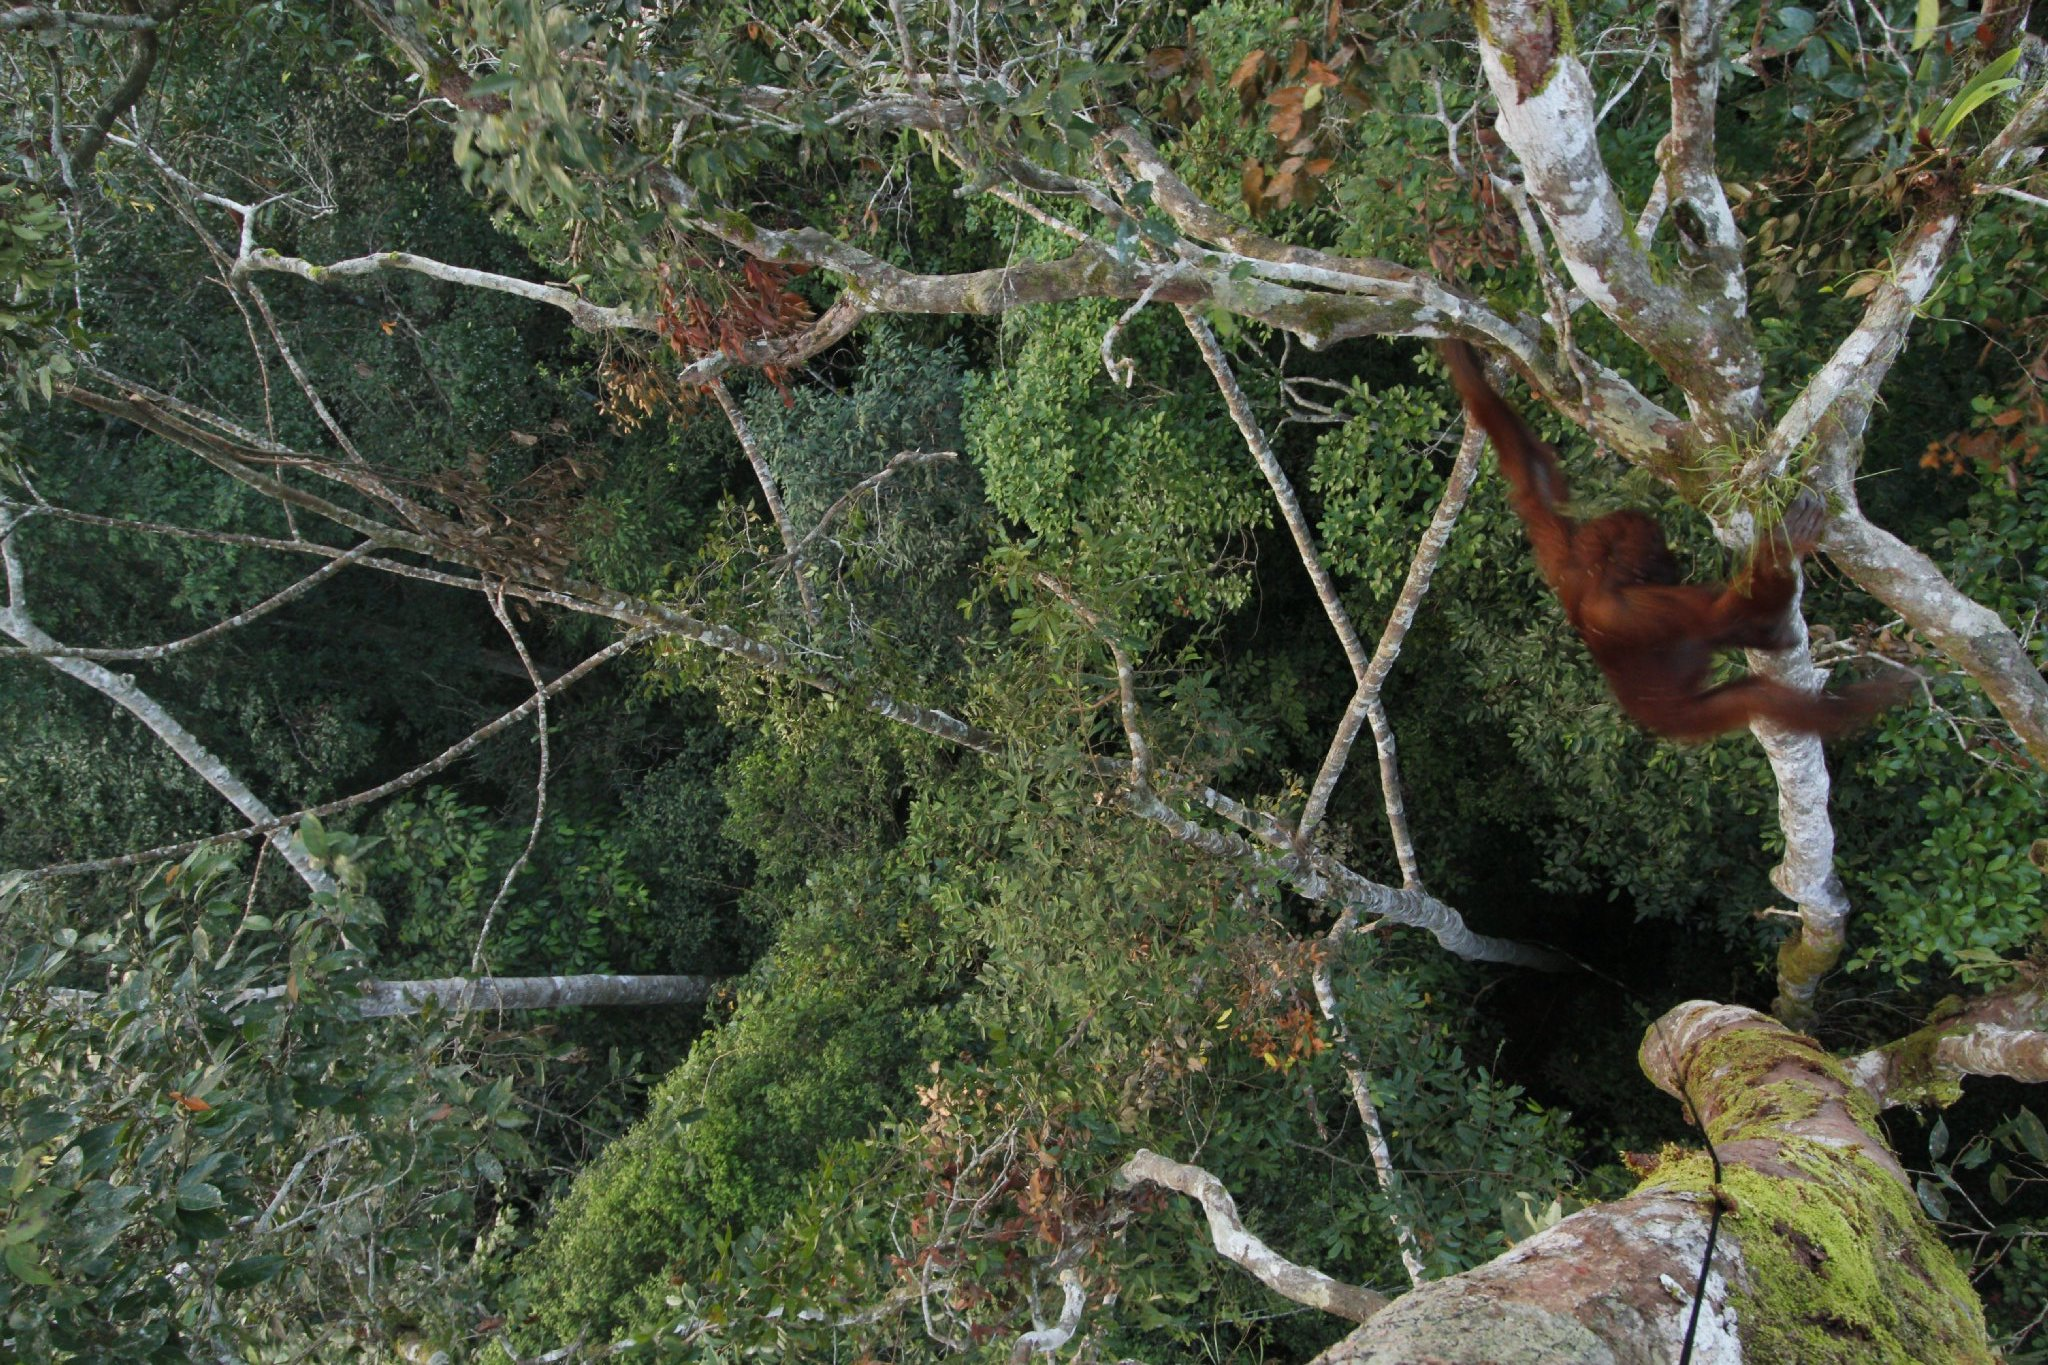 Sequence of photos from remote camera of Jumi, adult female, climbing down from Chaetocarpus tree (Chaetocarpus sp.) Bornean Orangutan  Wurmbii Sub-species (Pongo pygmaeus wurmbii) Gunung Palung Orangutan Project Cabang Panti Research Station Gunung Palung National Park West Kalimantan Province Island of Borneo Indonesia